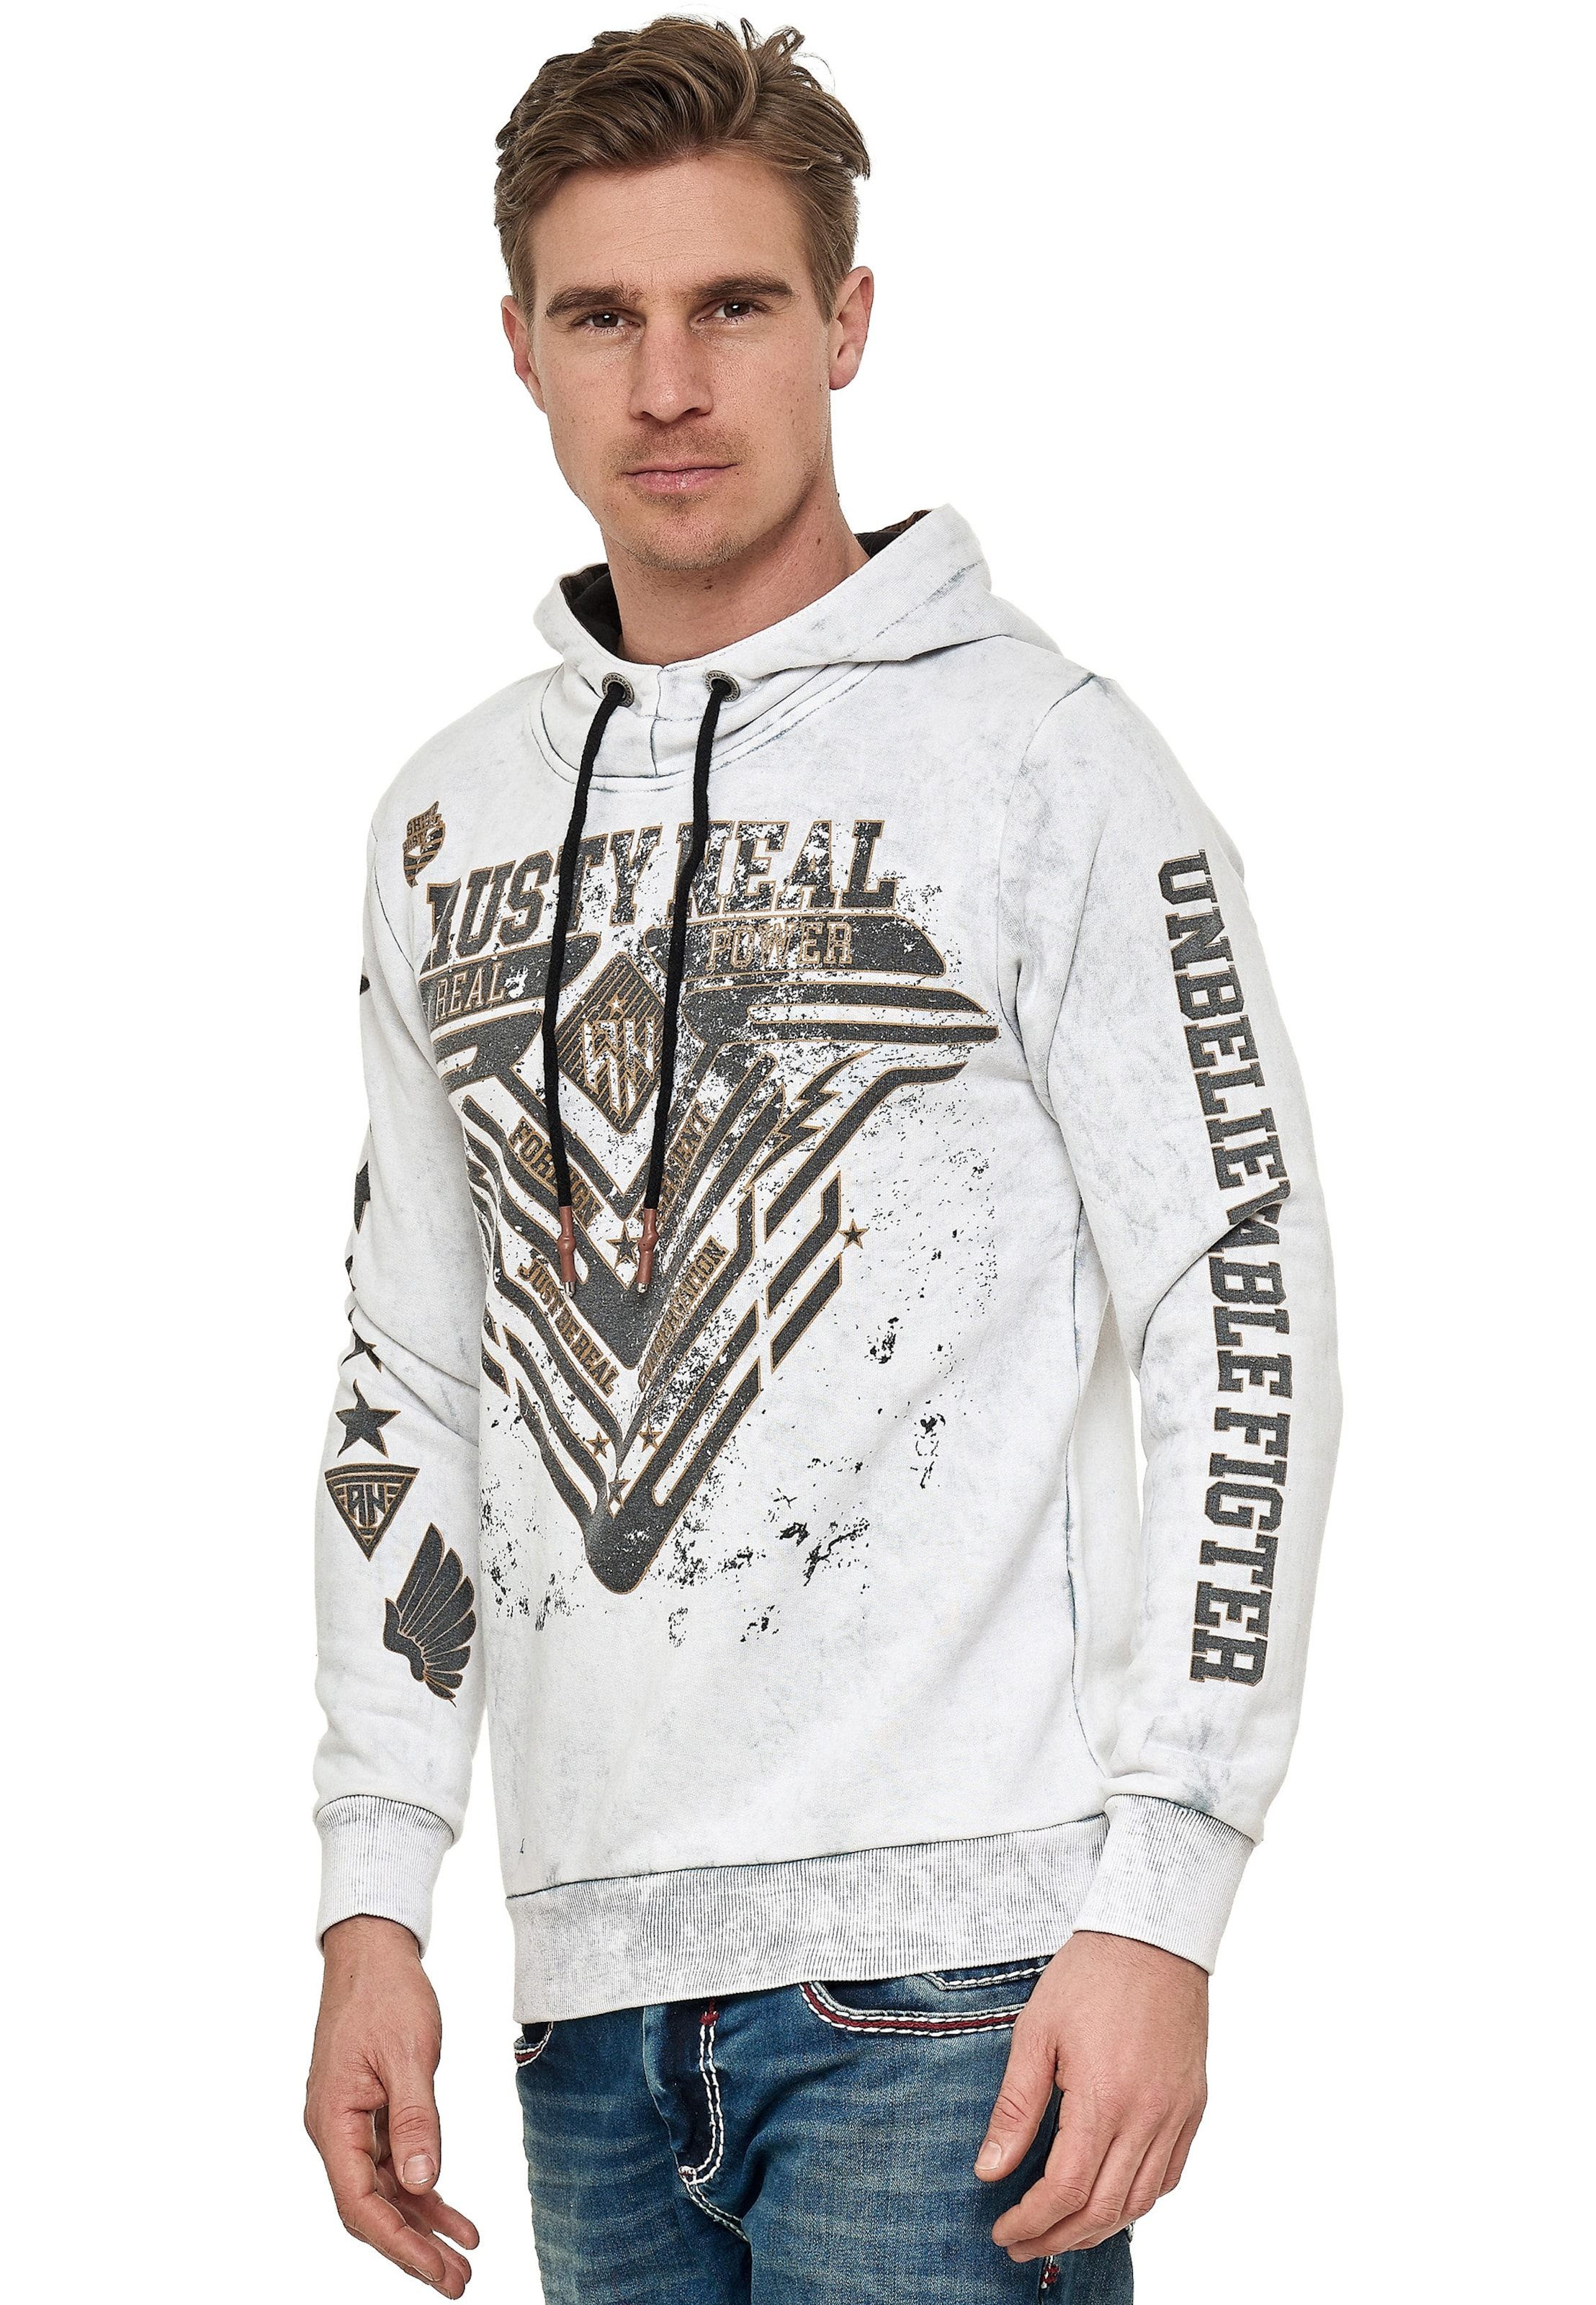 Rusty Neal Sweatshirt mit Oil Washed Front Print in weiß Logoprint 3367438